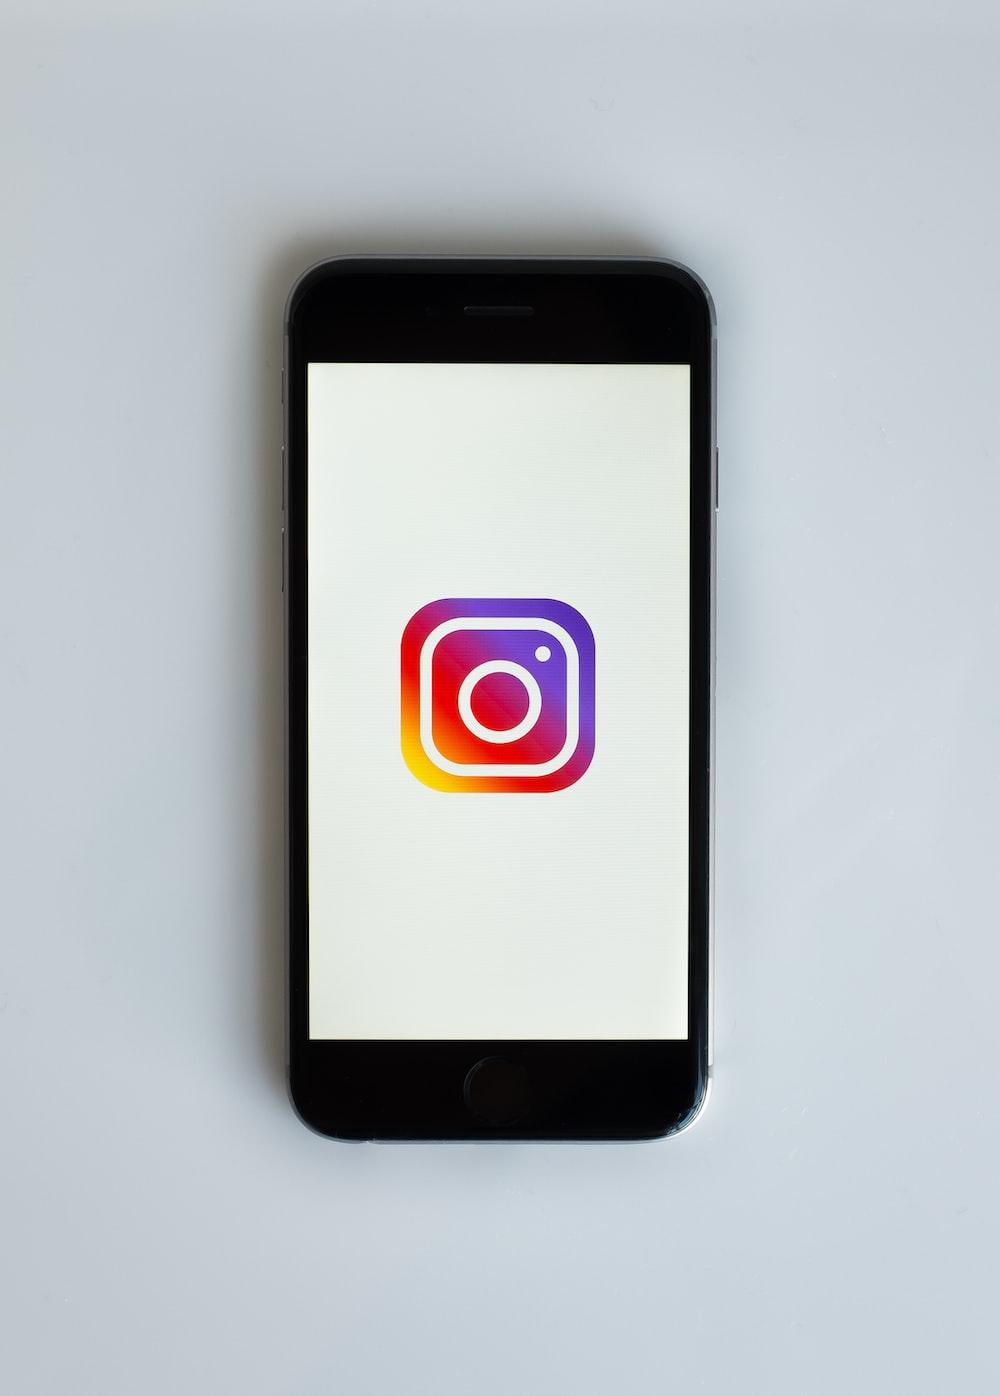 smartphone showing Instagram icon